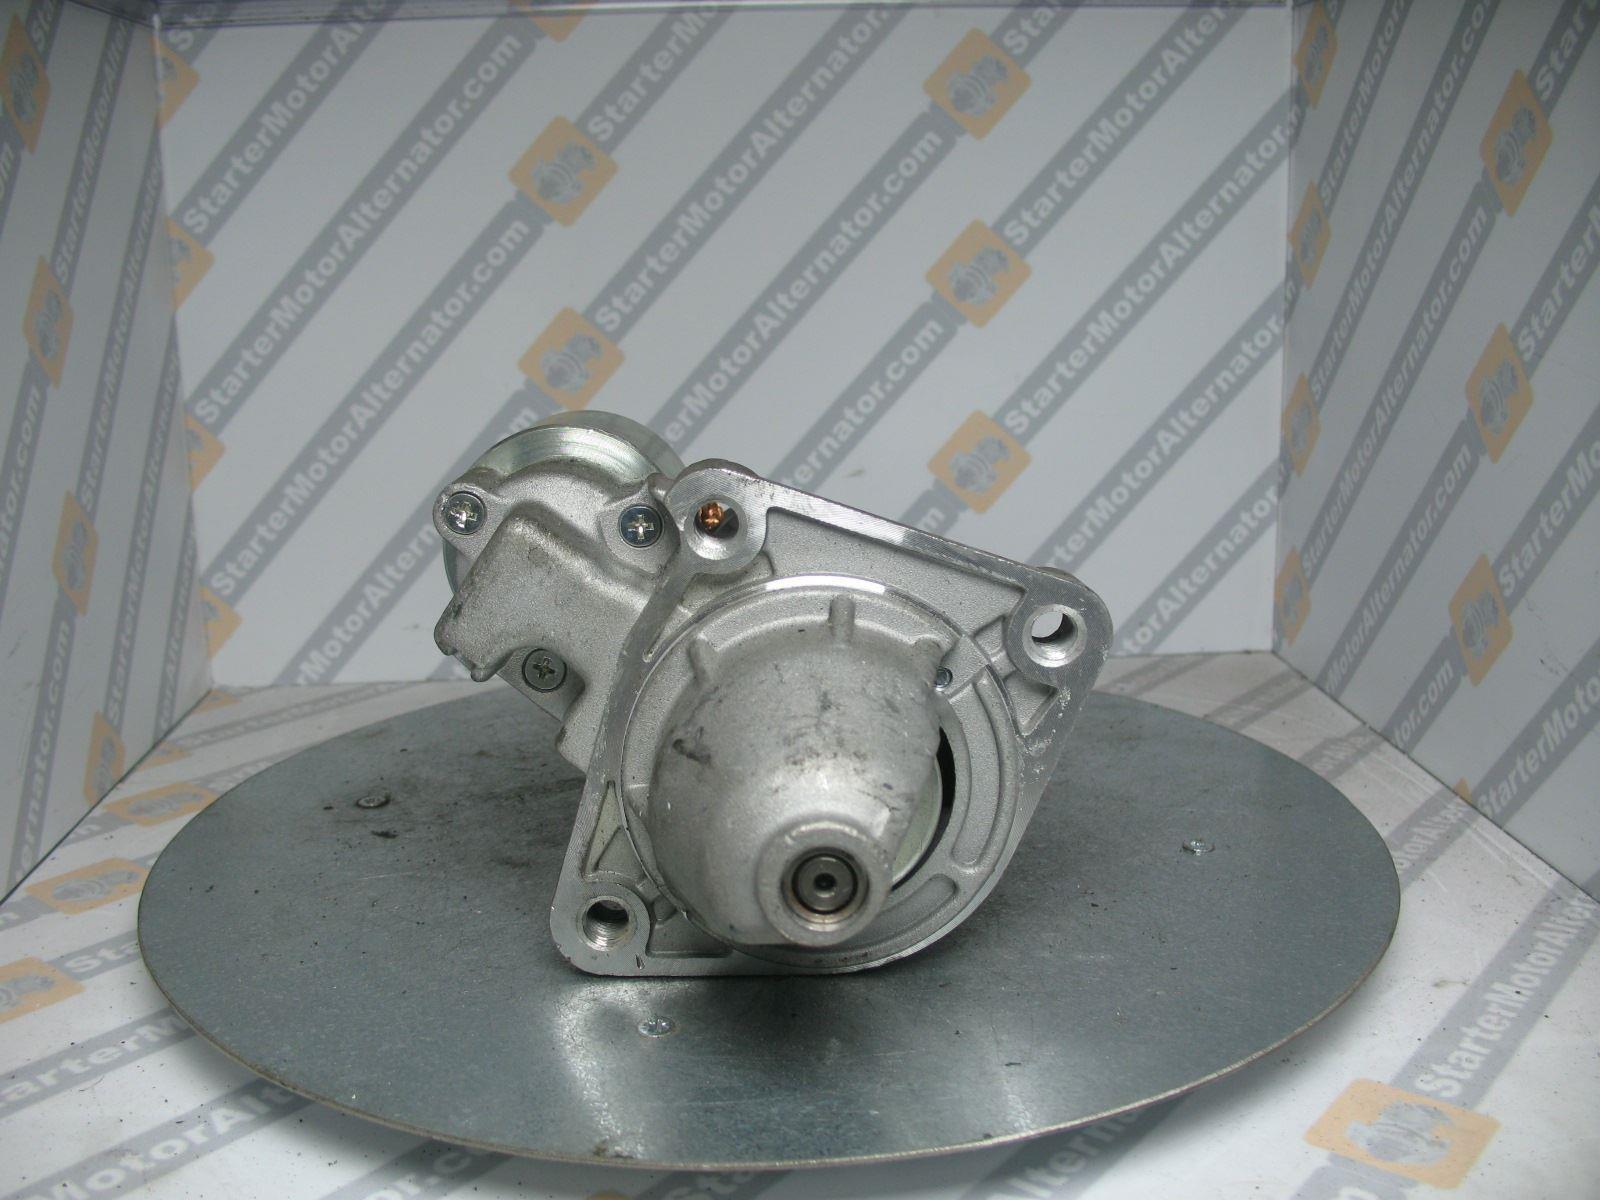 XIS9165 Starter Motor For Ford / Mazda